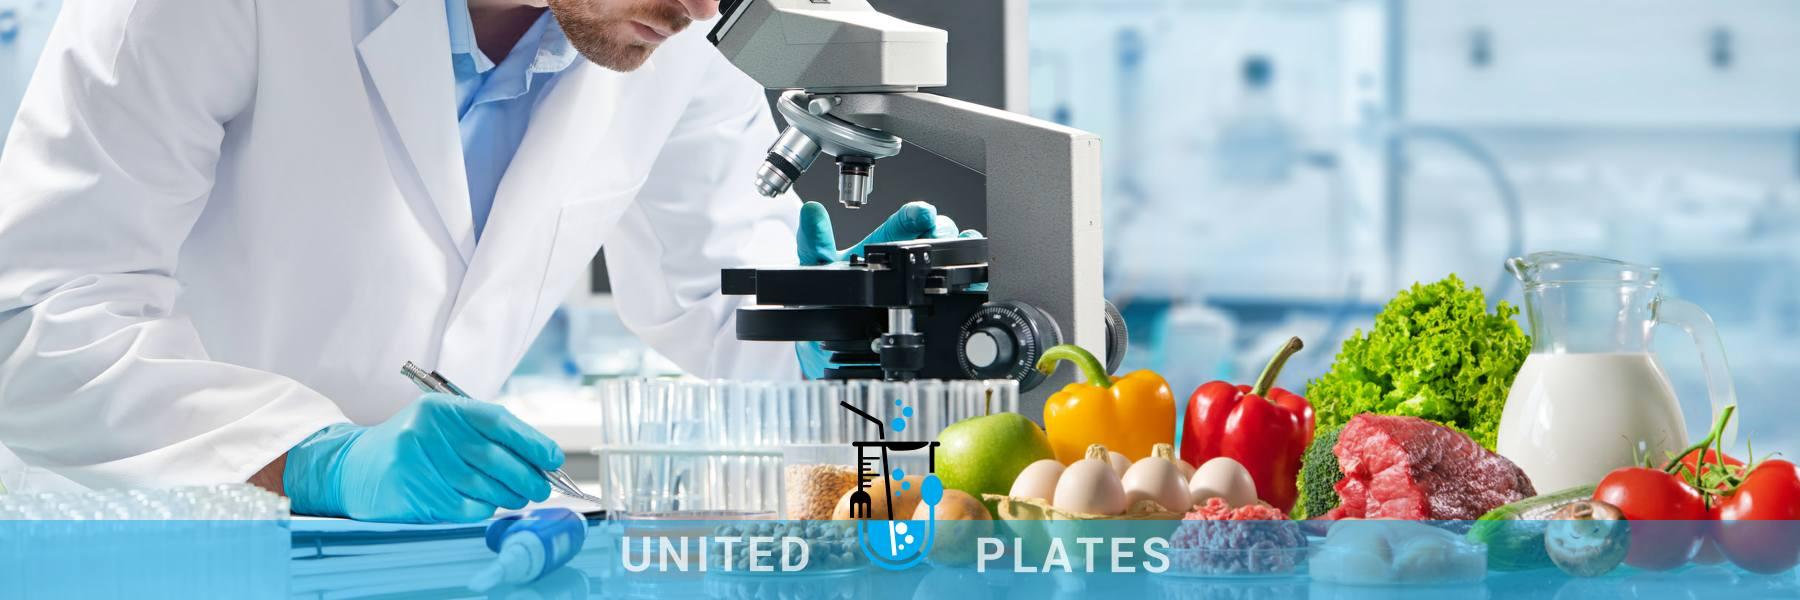 united plates development chefs outstanding culinary skills dublin